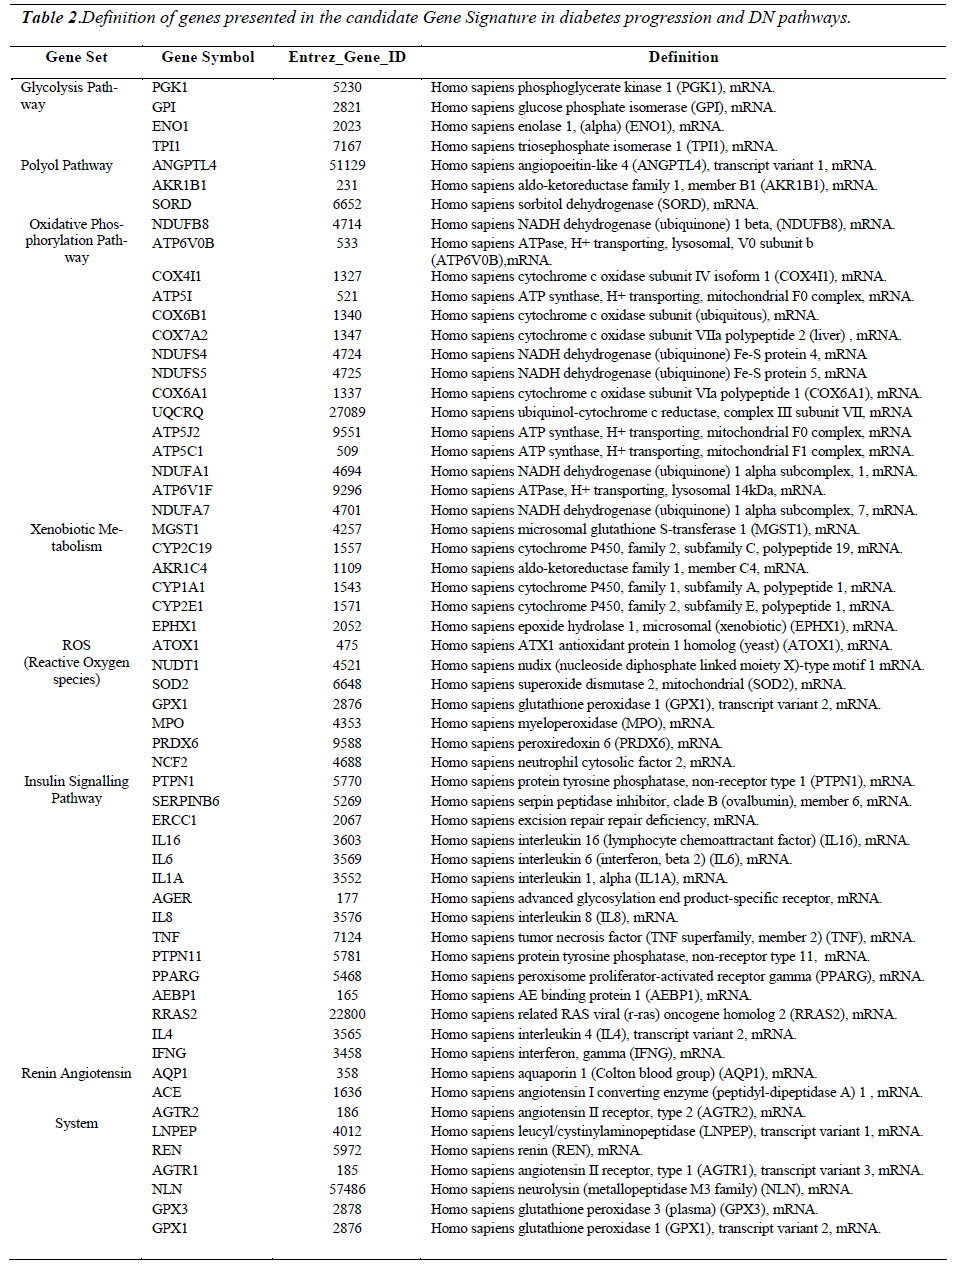 biomedres-genes-presented